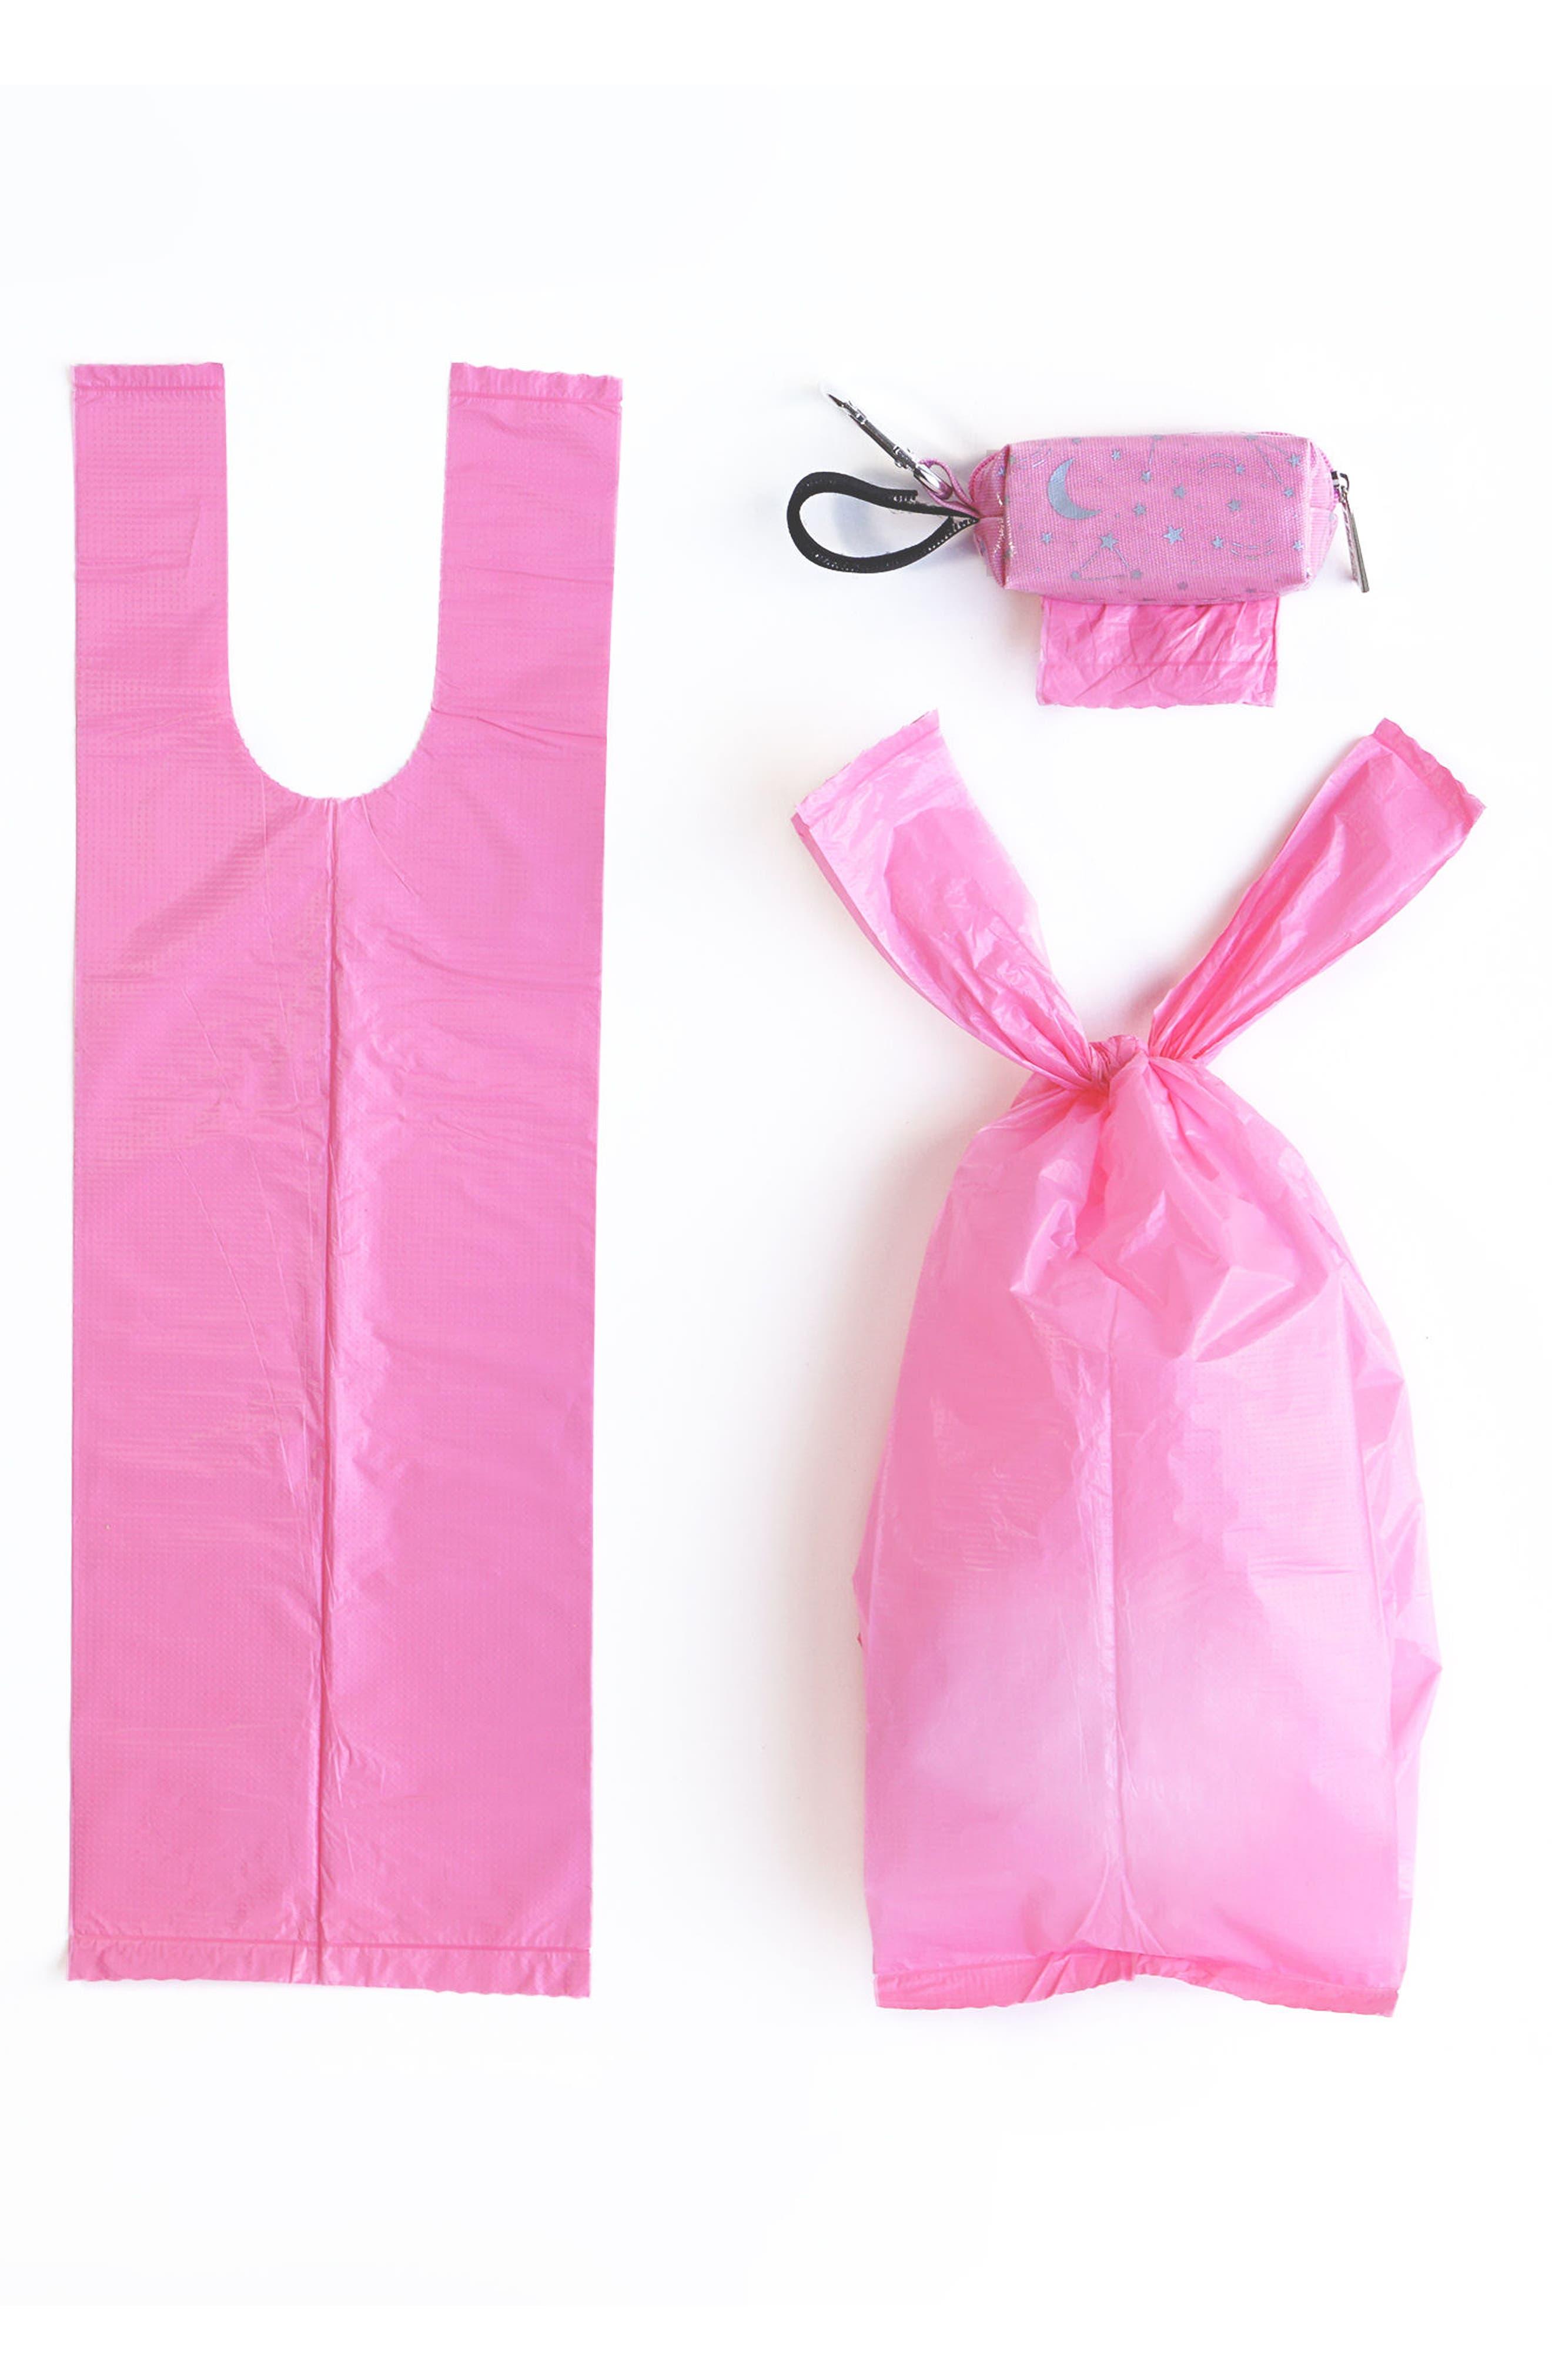 Portable Clip-On Dispenser & Bag Set,                             Alternate thumbnail 3, color,                             Pink/ Grey